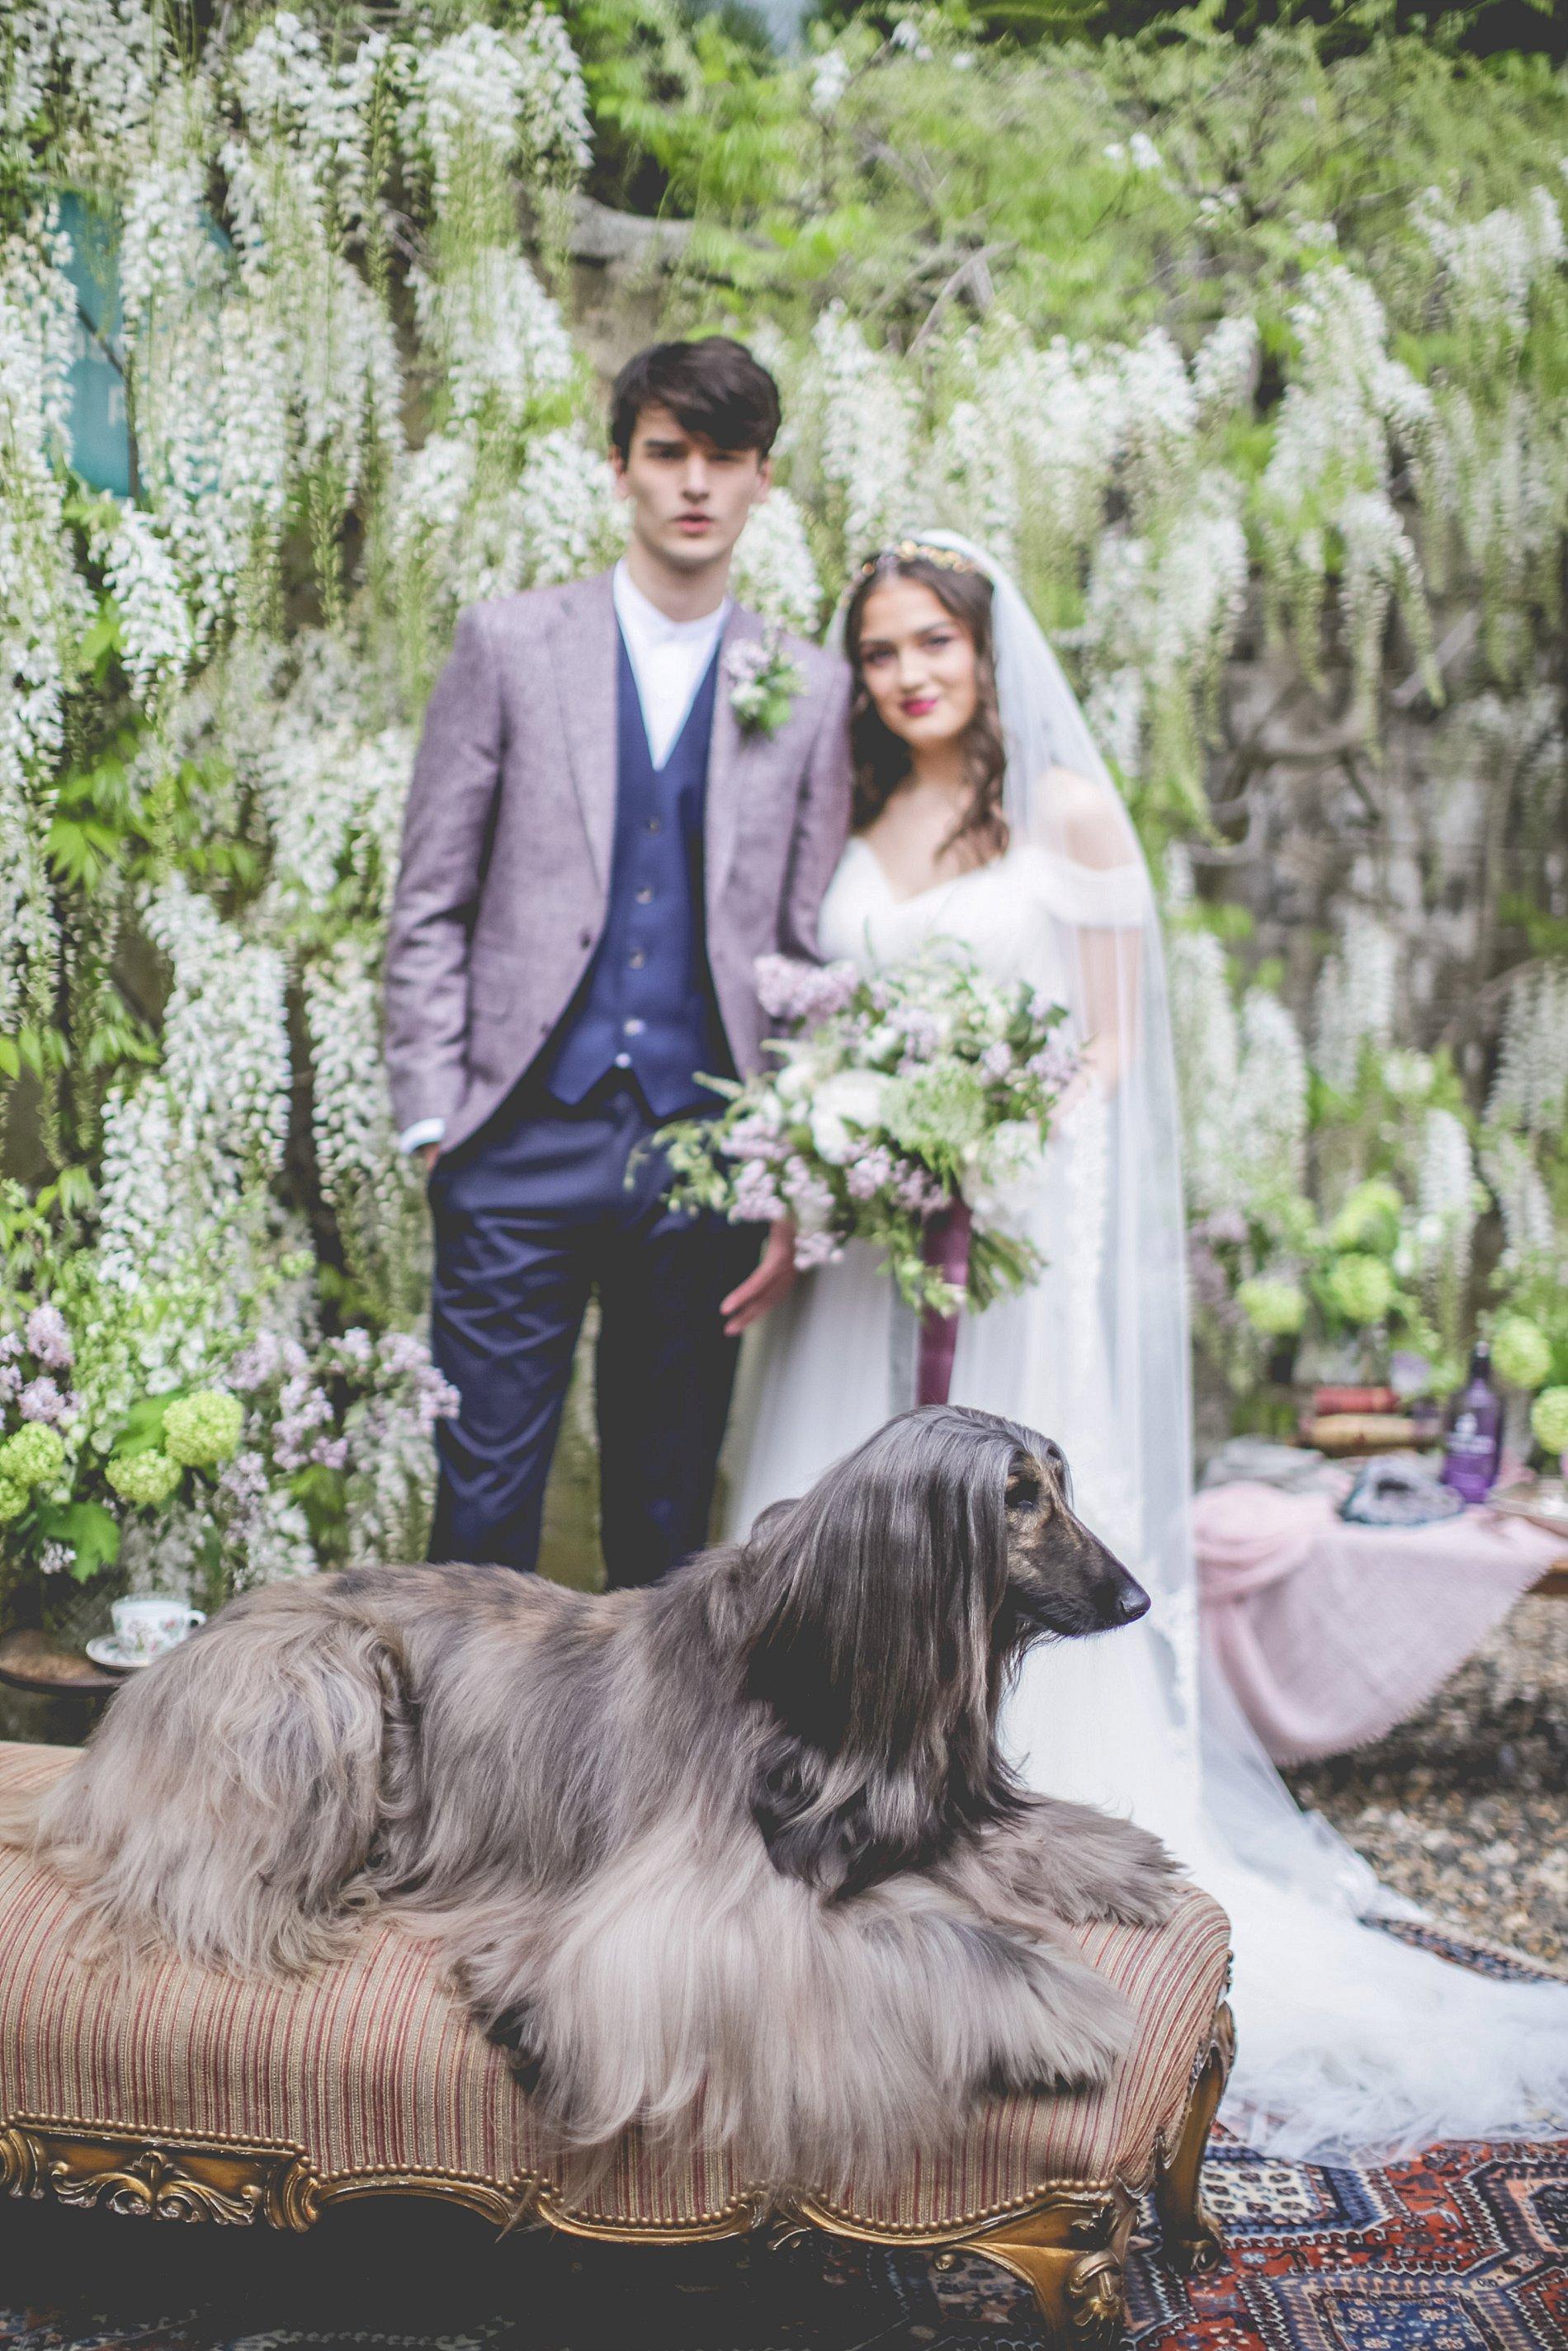 A Styled Bridal Shoot at Eshott Hall (c) Sean Elliott Photography (16)